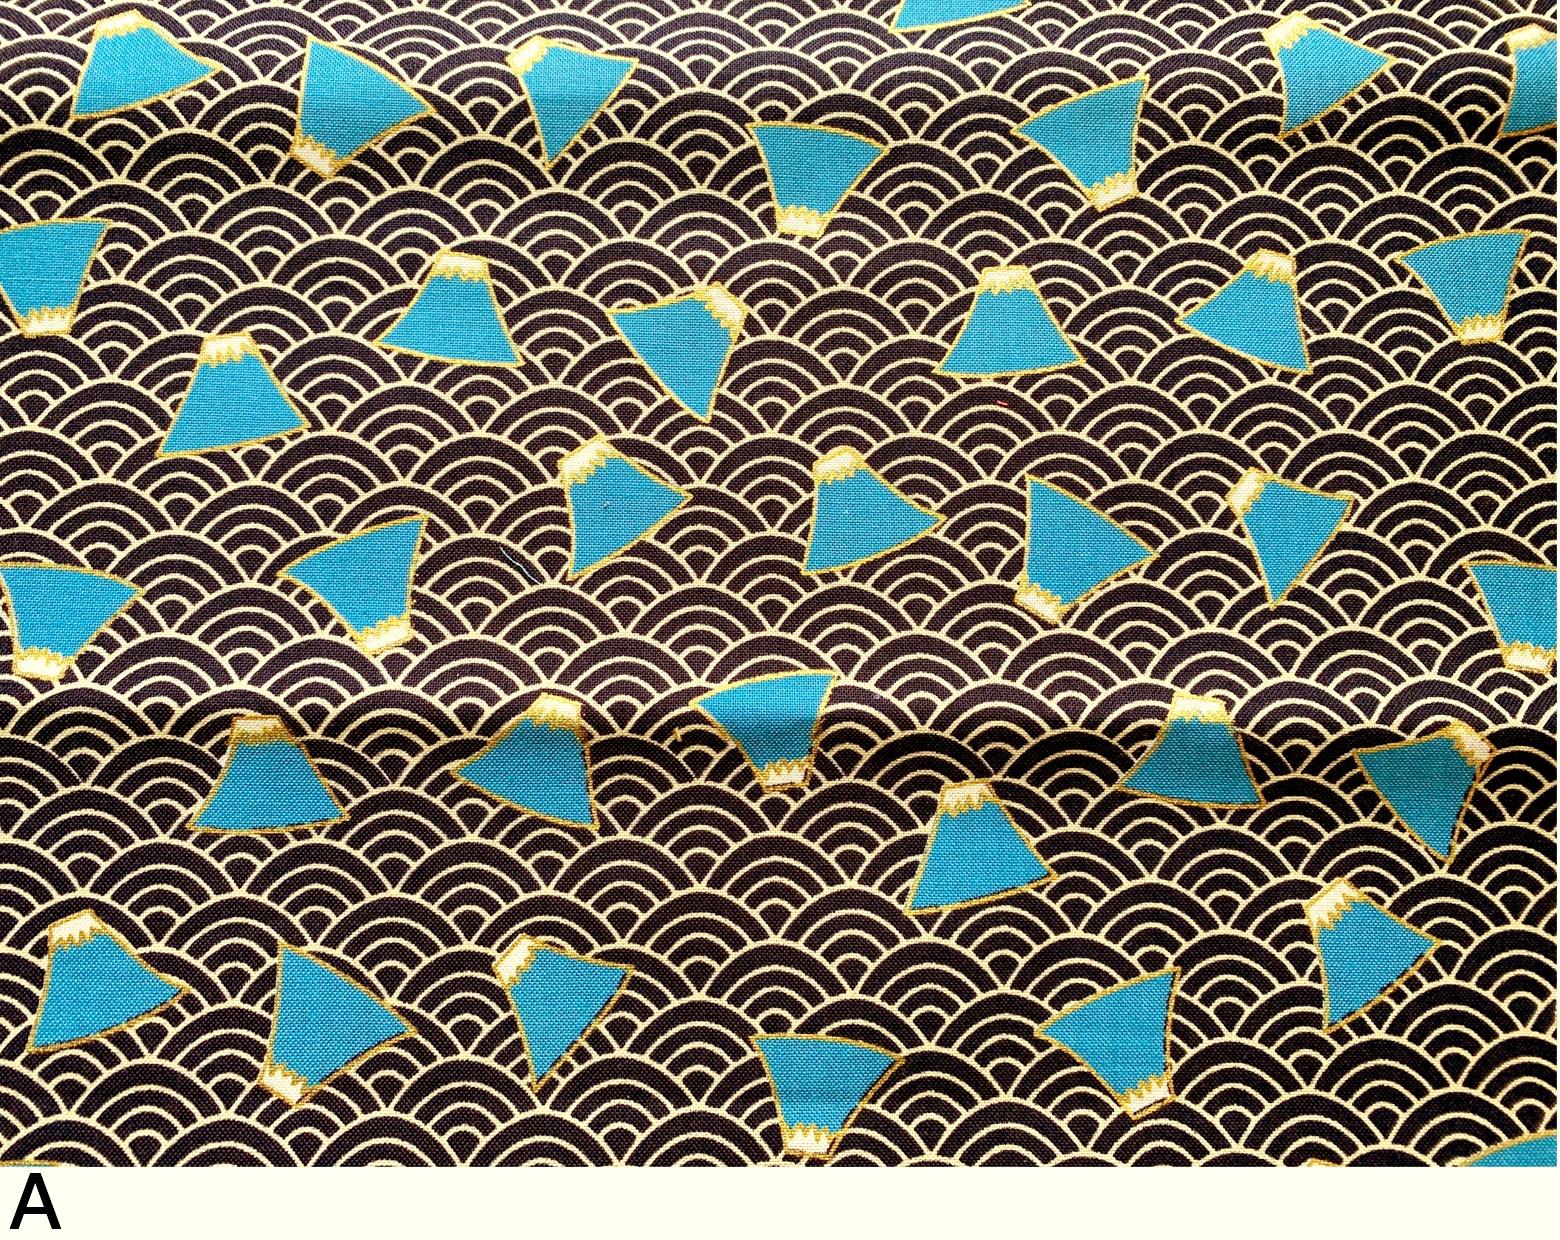 HJ2098 Mt.Fuji seigaiha Mountain Japanese pattern fabric